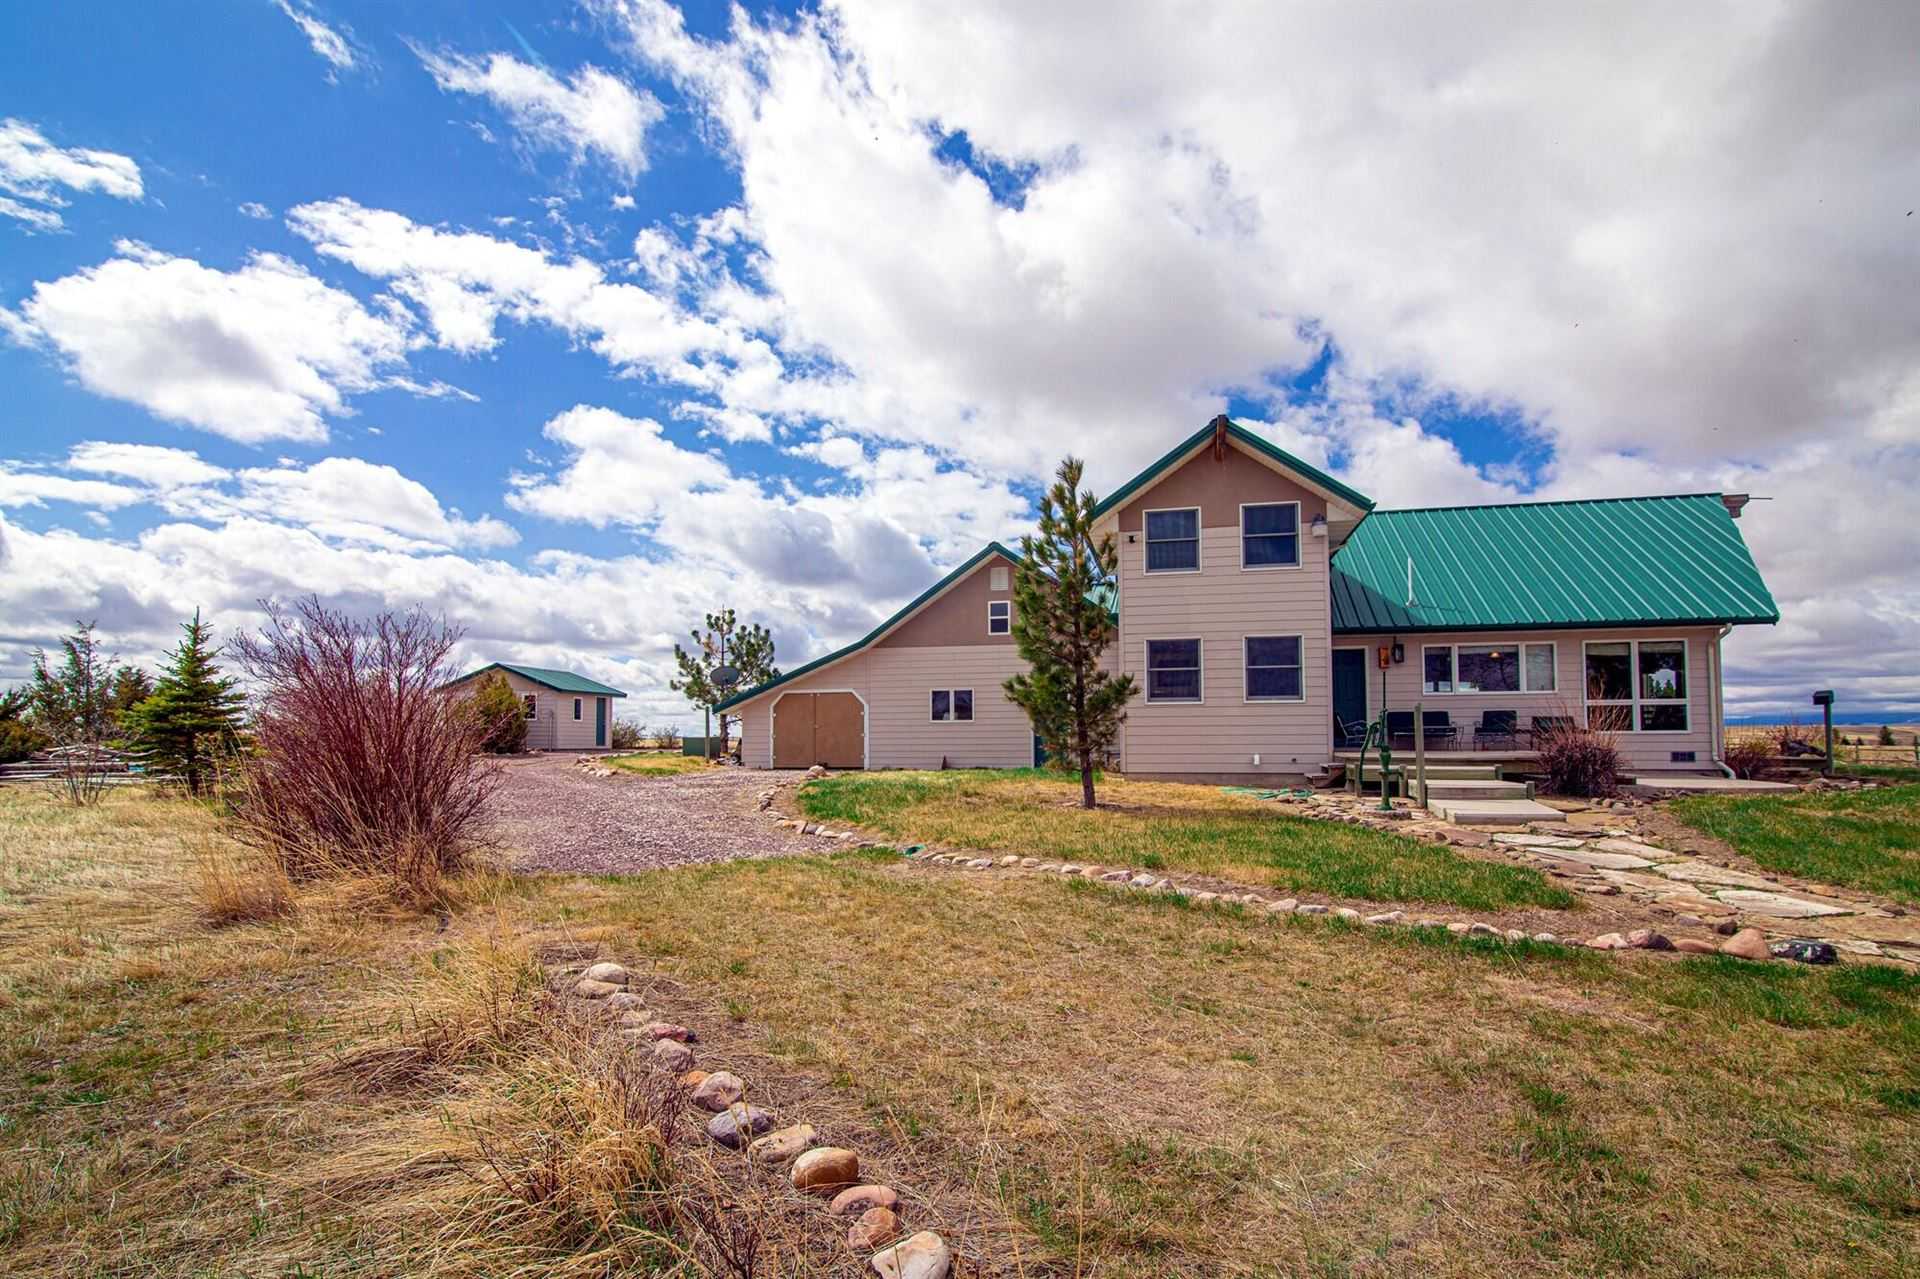 Photo of 9 Mountain View Drive, Choteau, MT 59422 (MLS # 22111707)